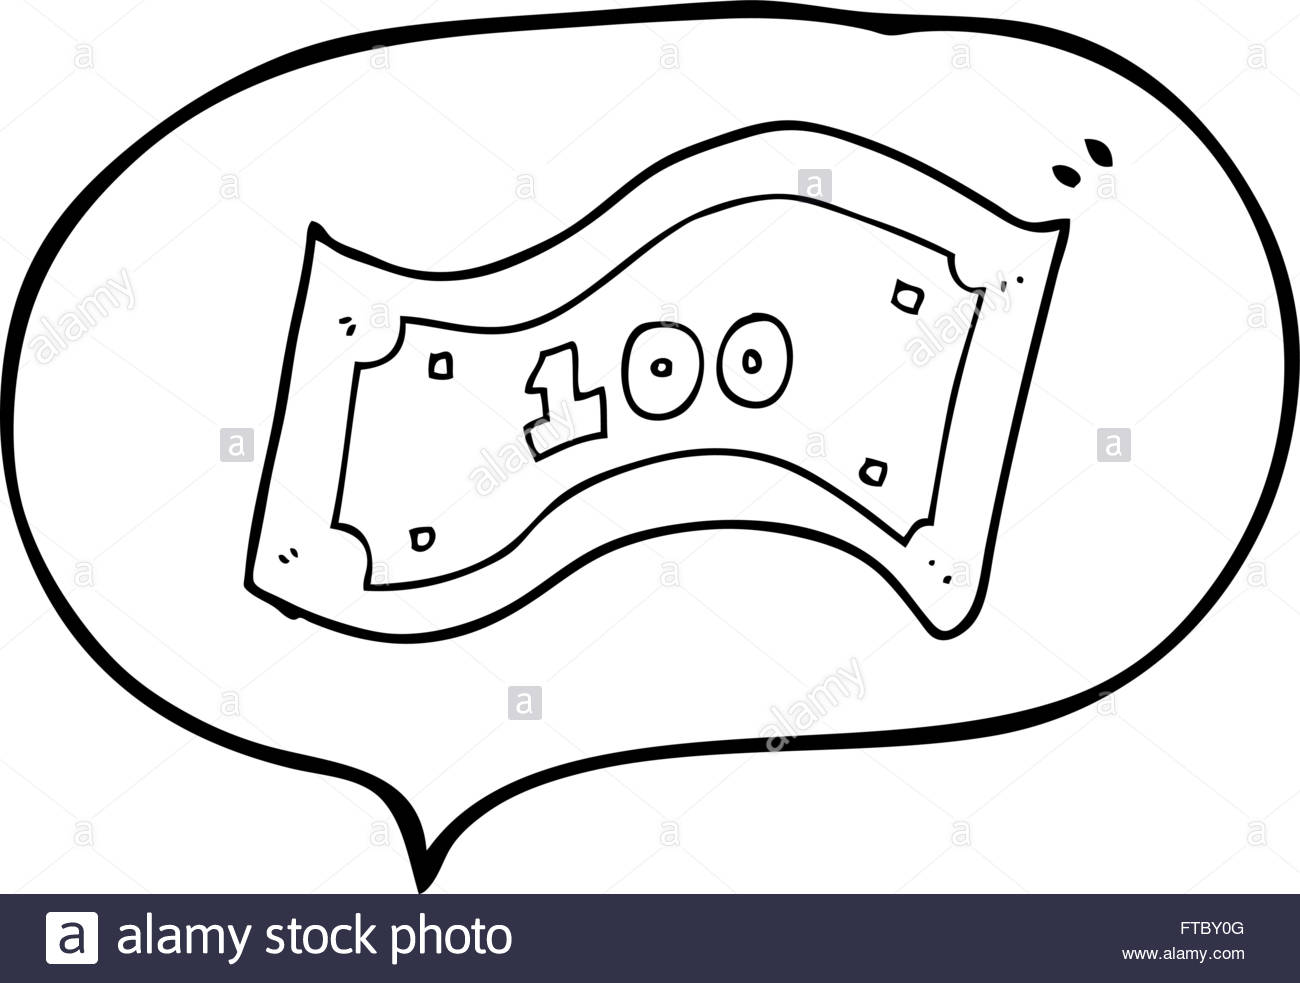 1300x983 Freehand Drawn Speech Bubble Cartoon 100 Dollar Bill Stock Vector